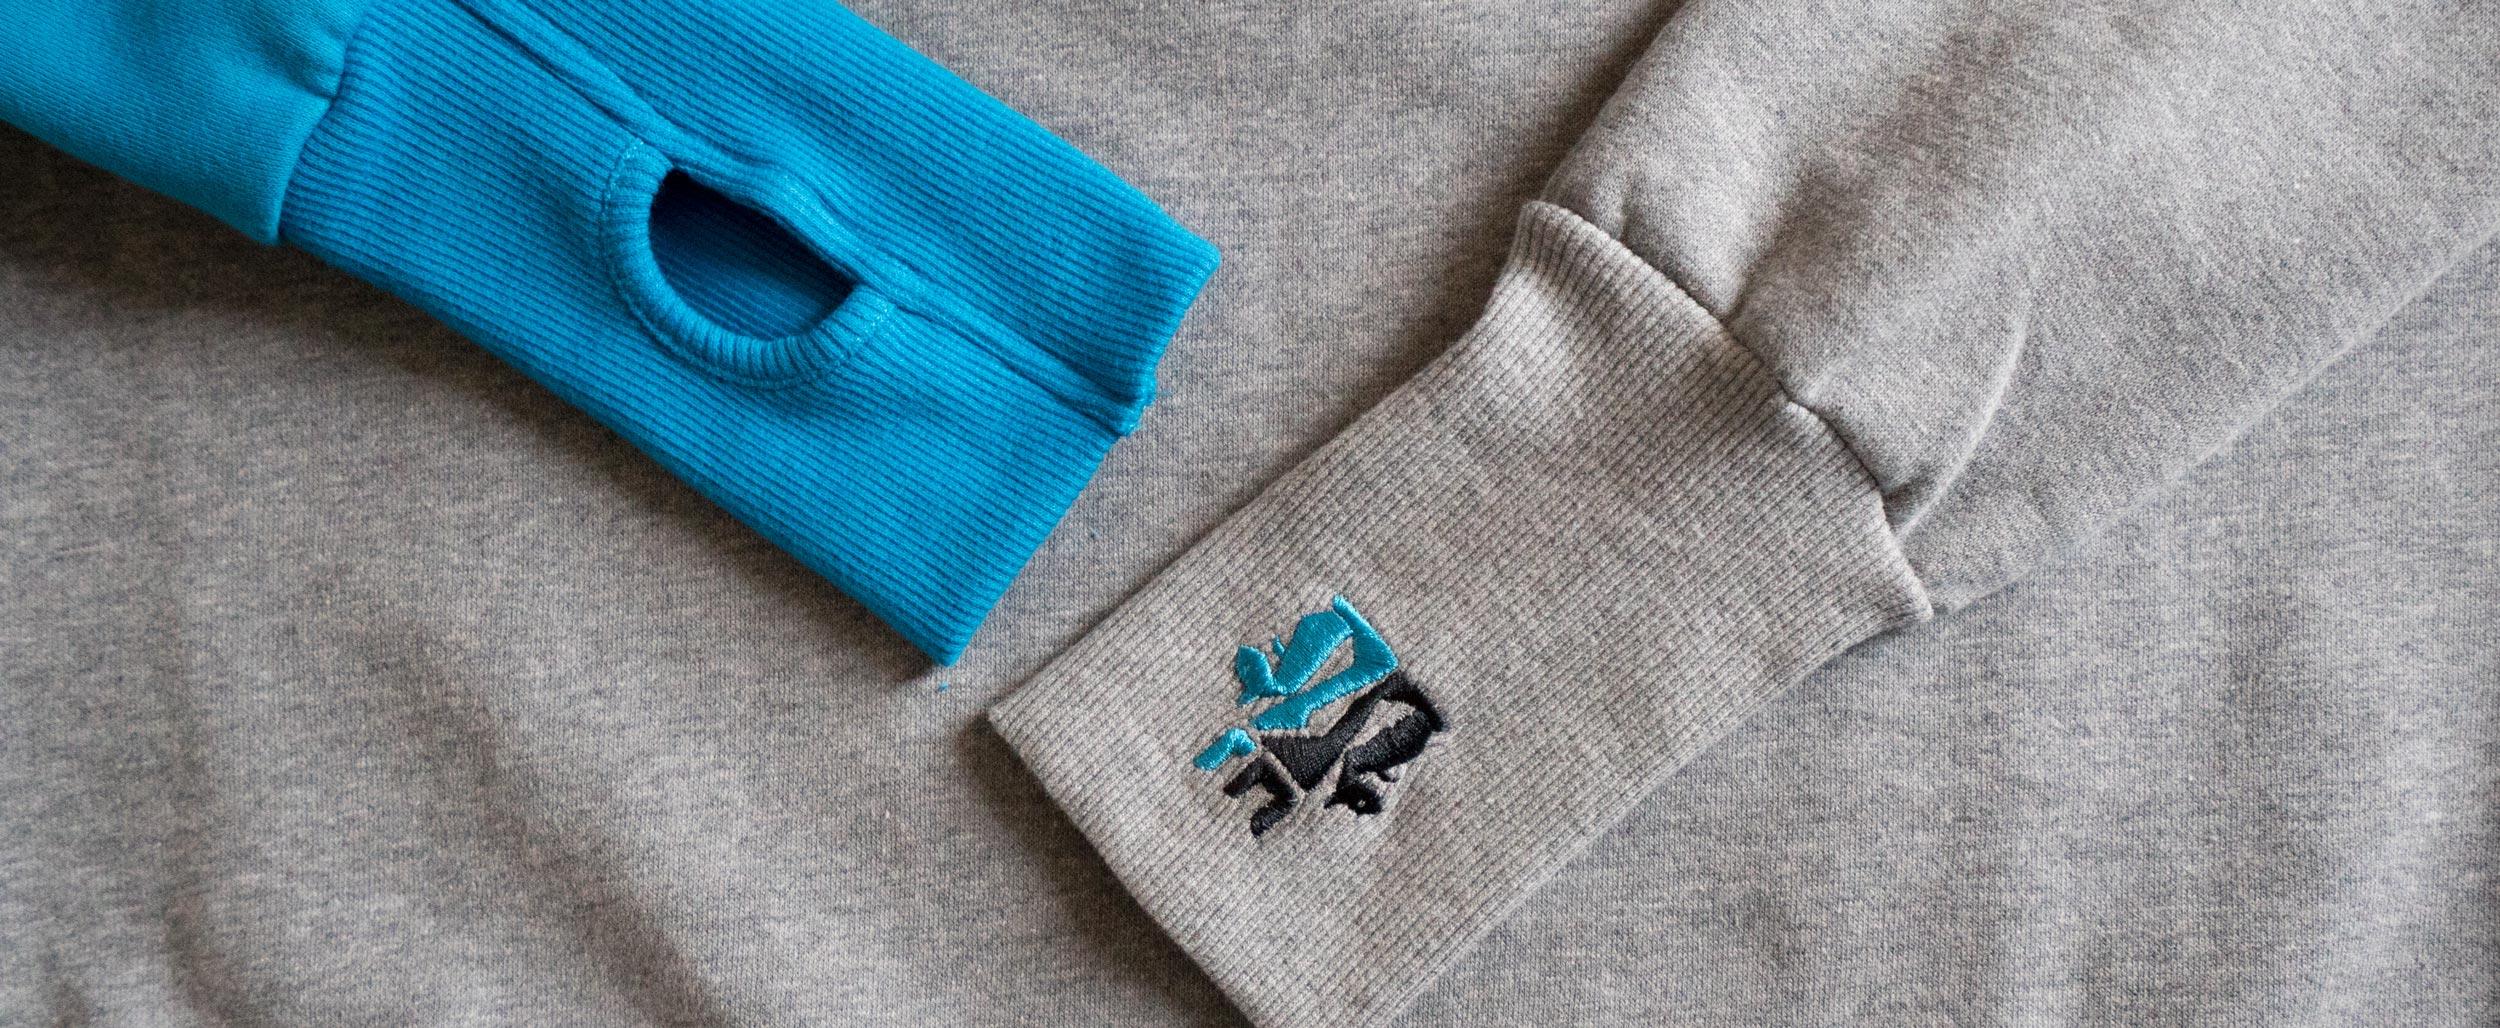 Wefew-clothing_Parkour-Freerunning_Tshirts_95_Sweater GrHEY